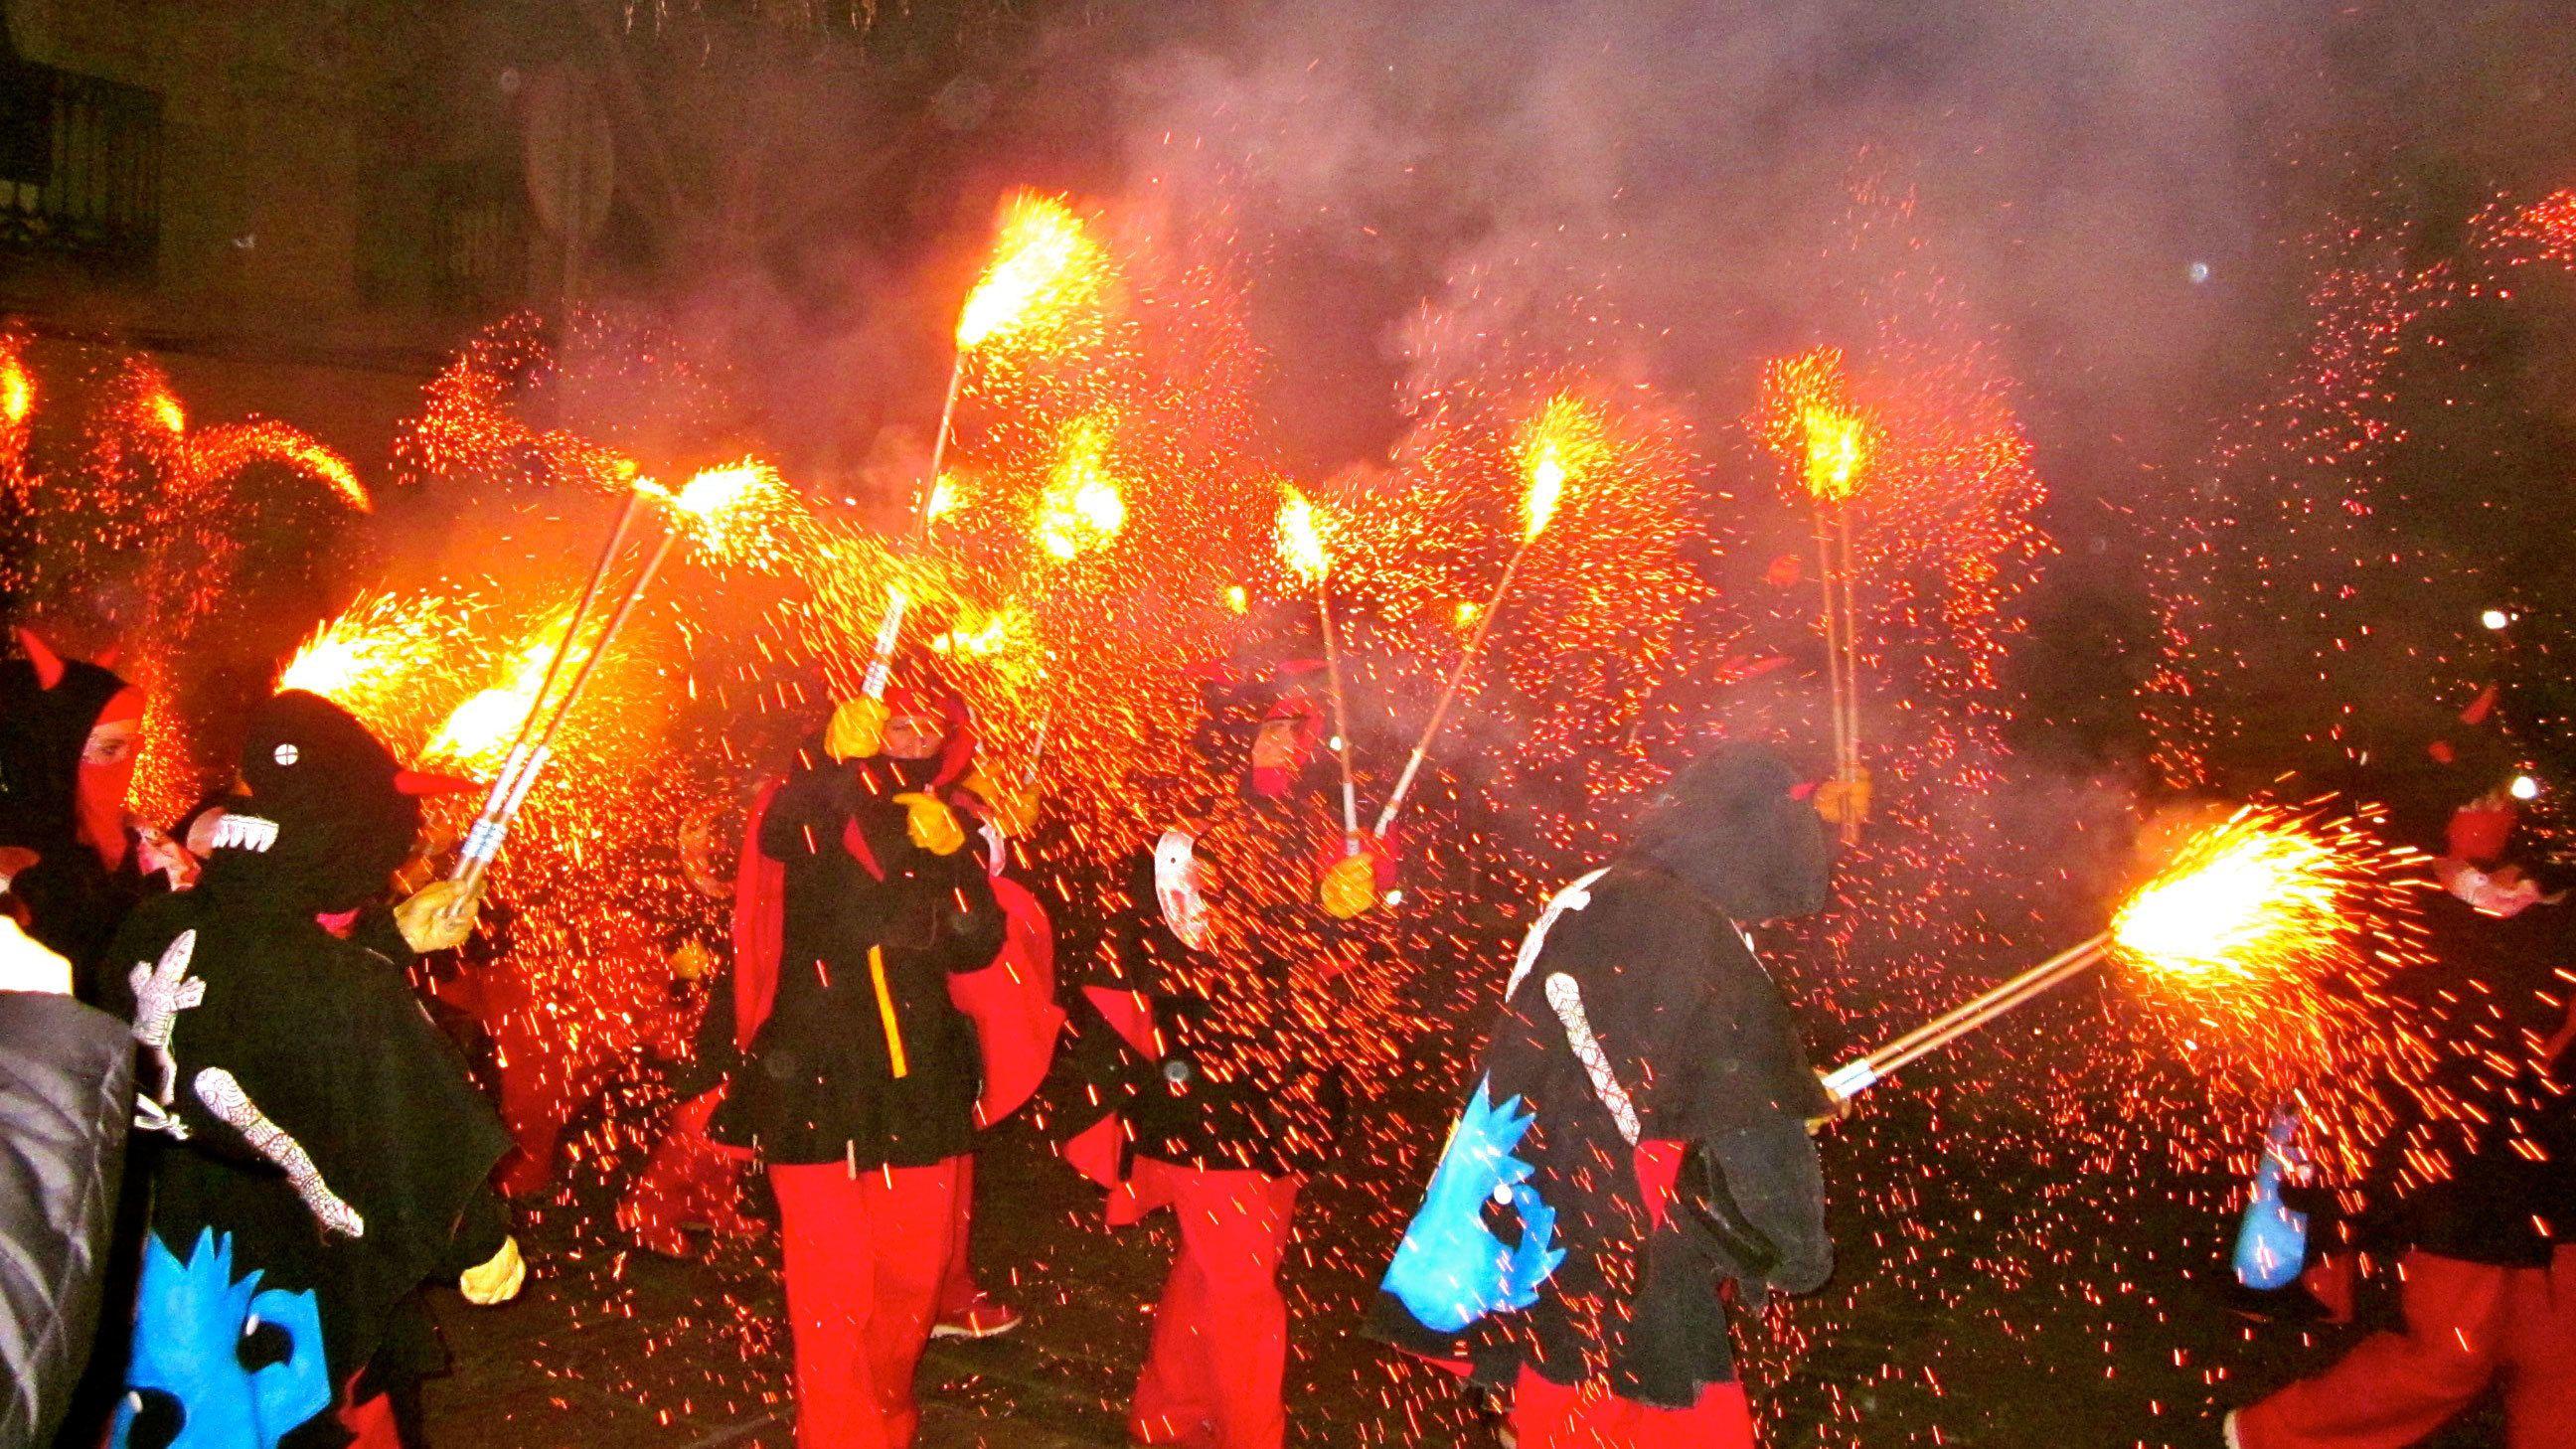 group of people waving fireworks for correfoc celebration in Barcelona